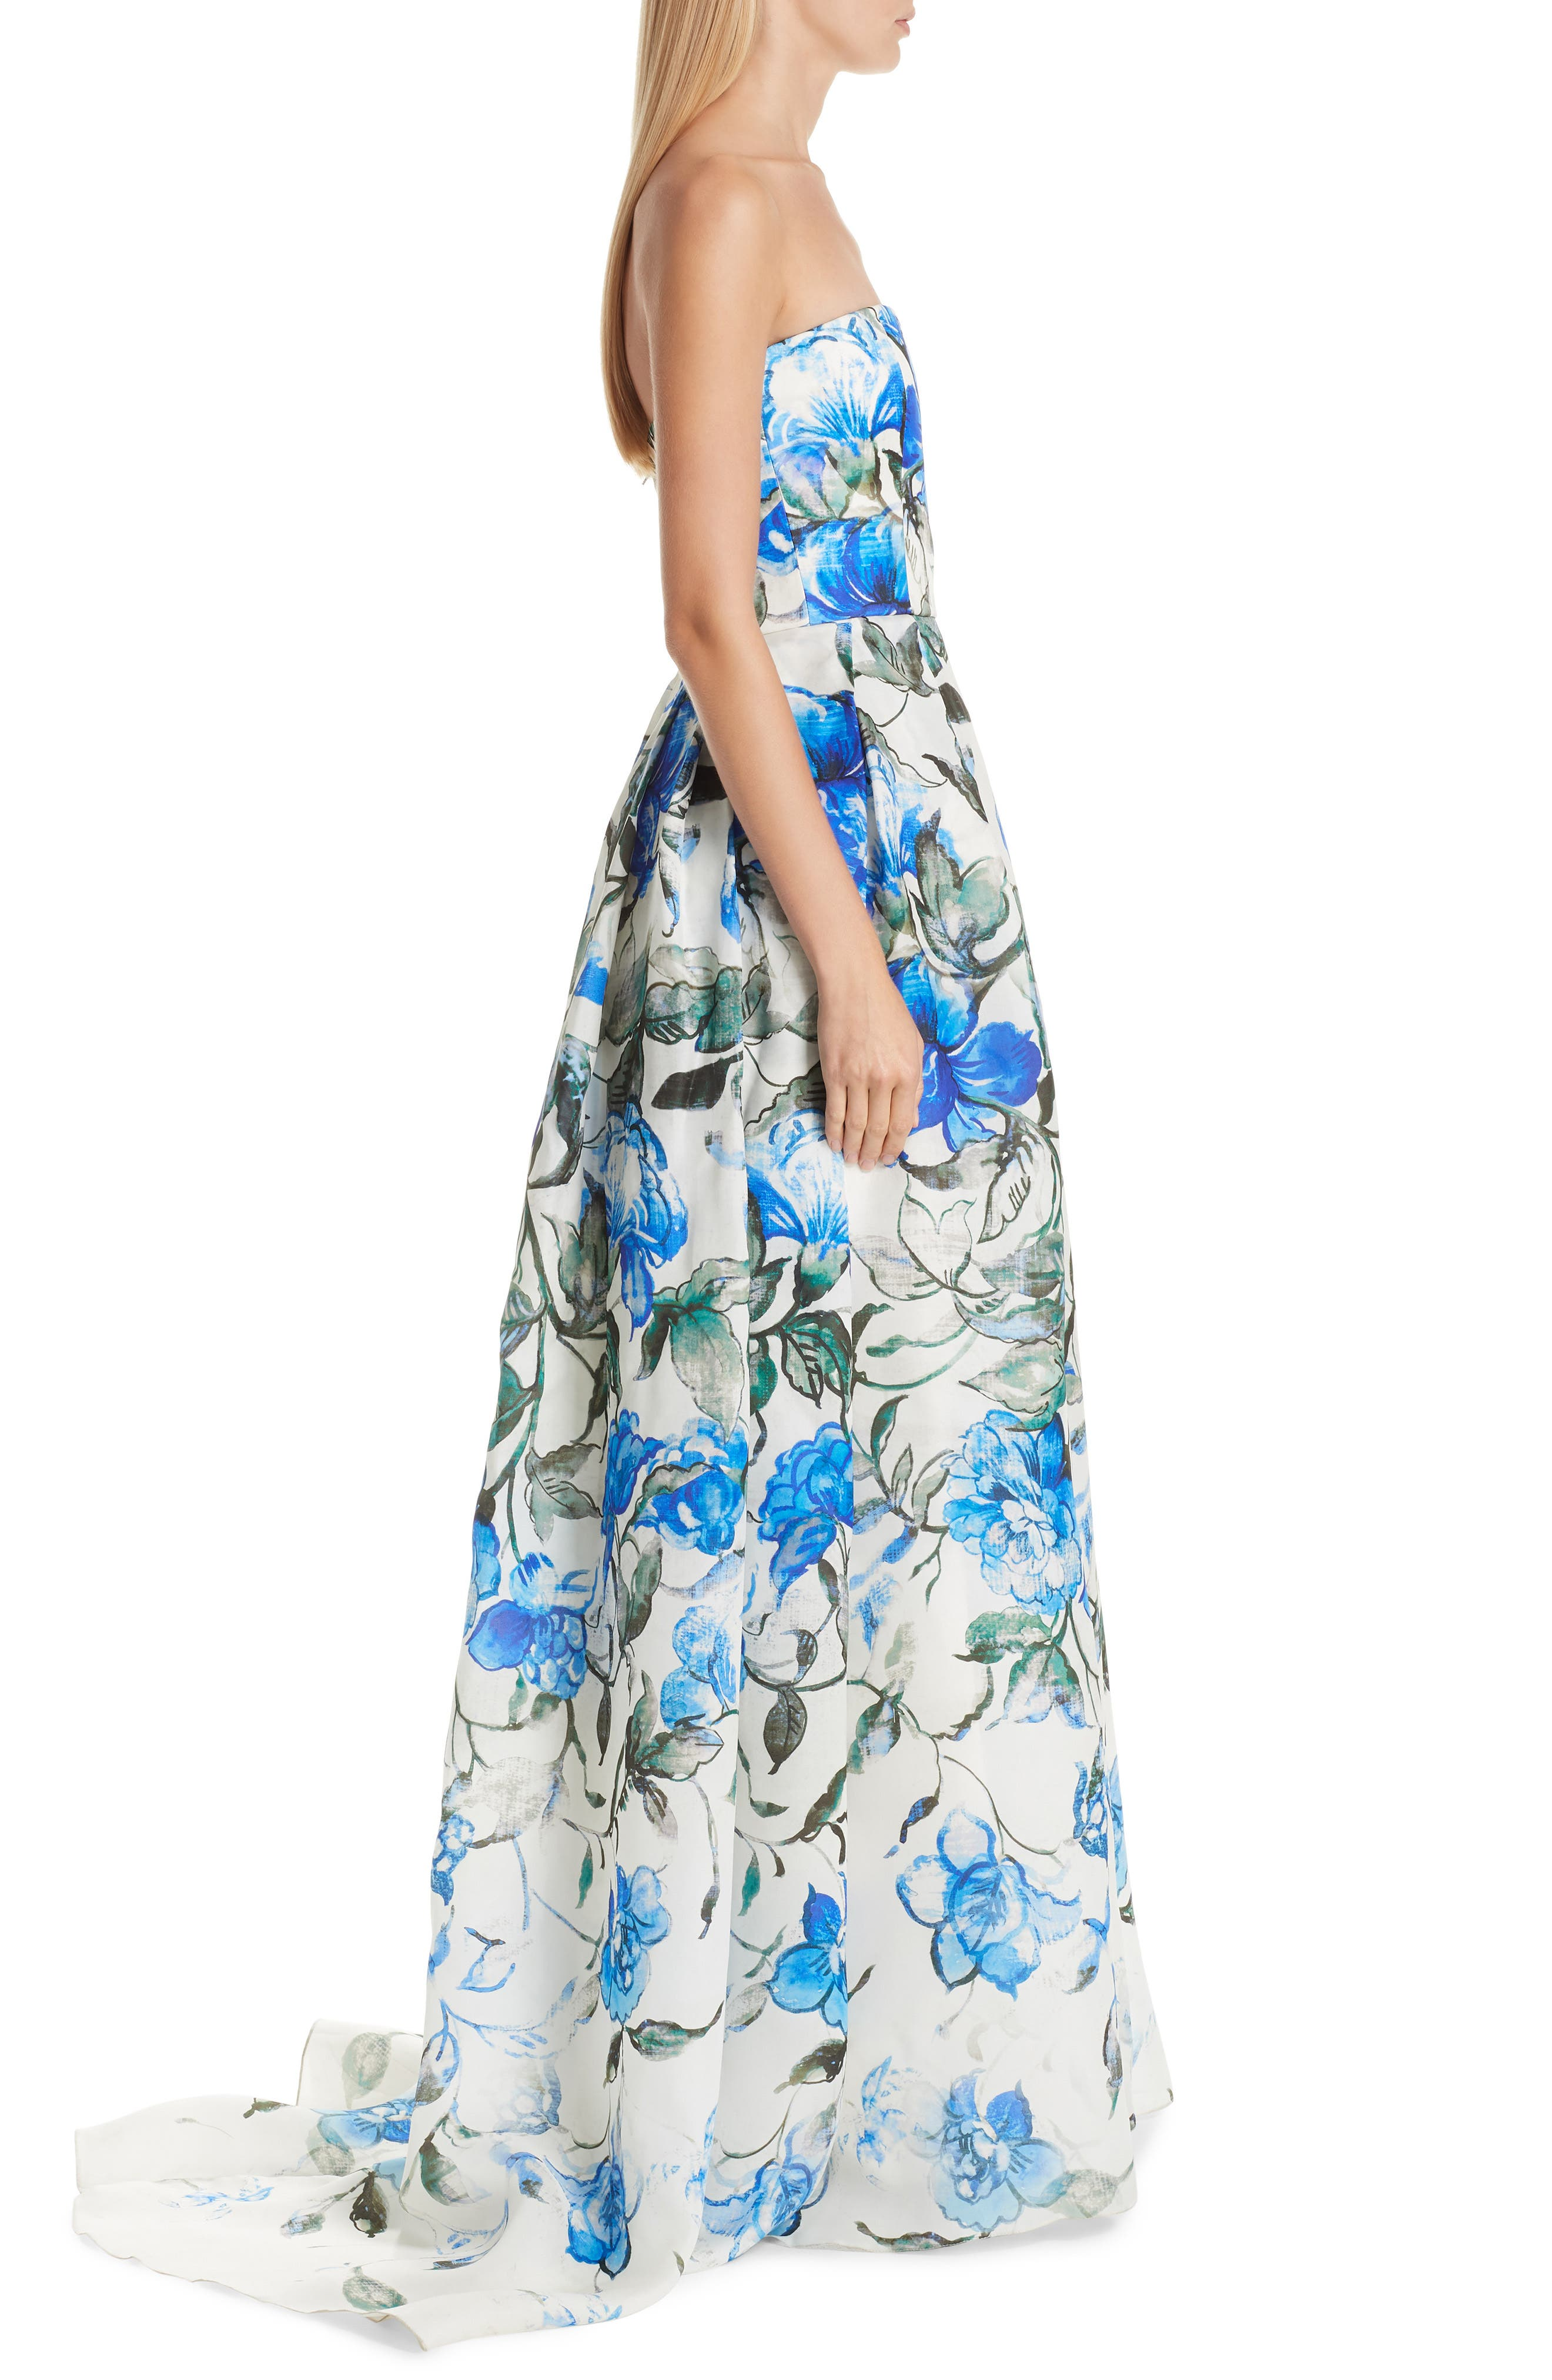 Floral Strapless Silk Evening Dress,                             Alternate thumbnail 3, color,                             PERSIAN BLUE MULTI